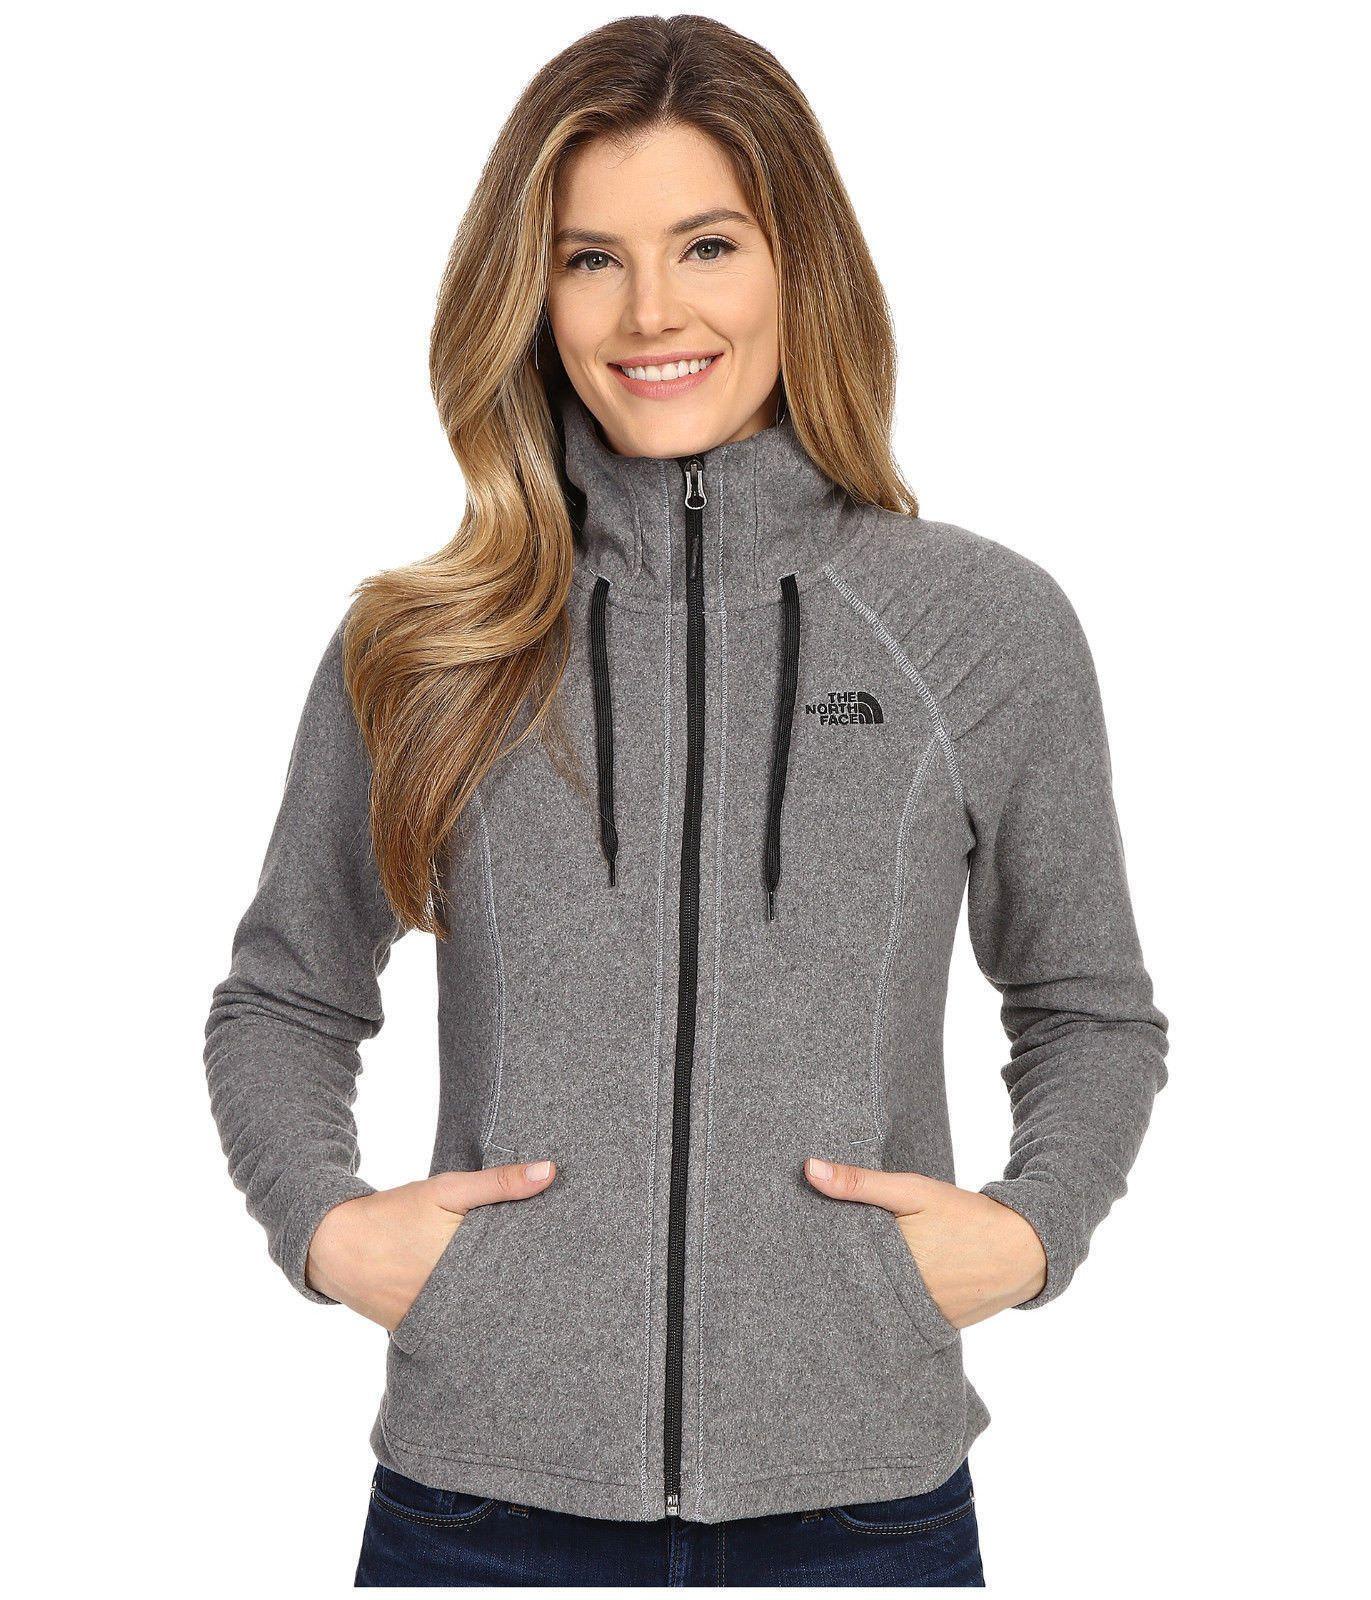 001162d6d Coats and Jackets 63862: New Womens The North Face Mezzaluna Hoodie ...